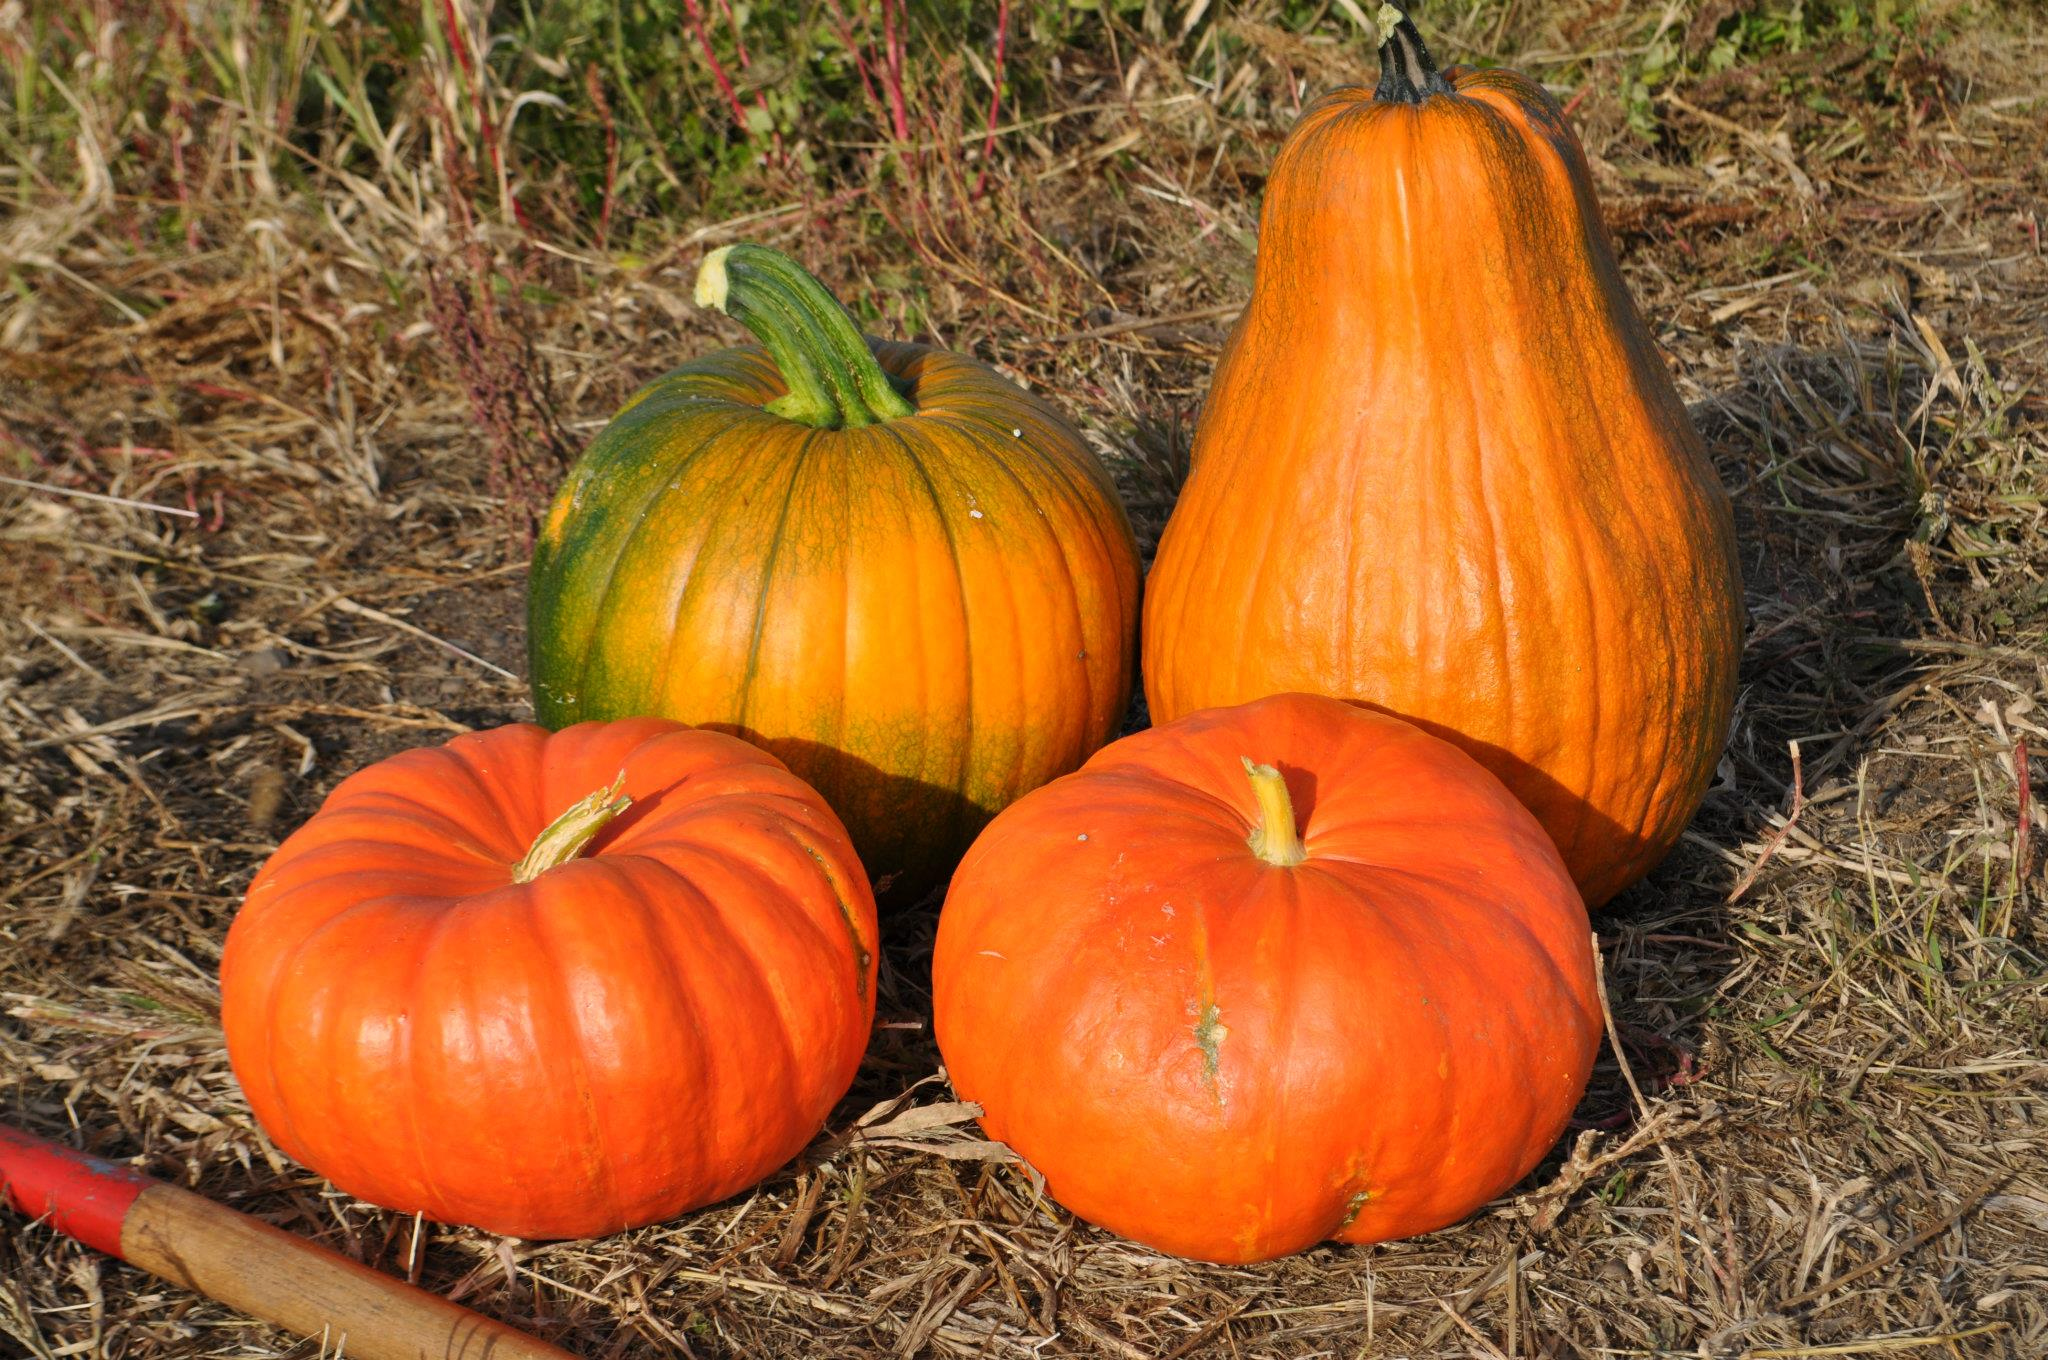 how to cook half a pumpkin